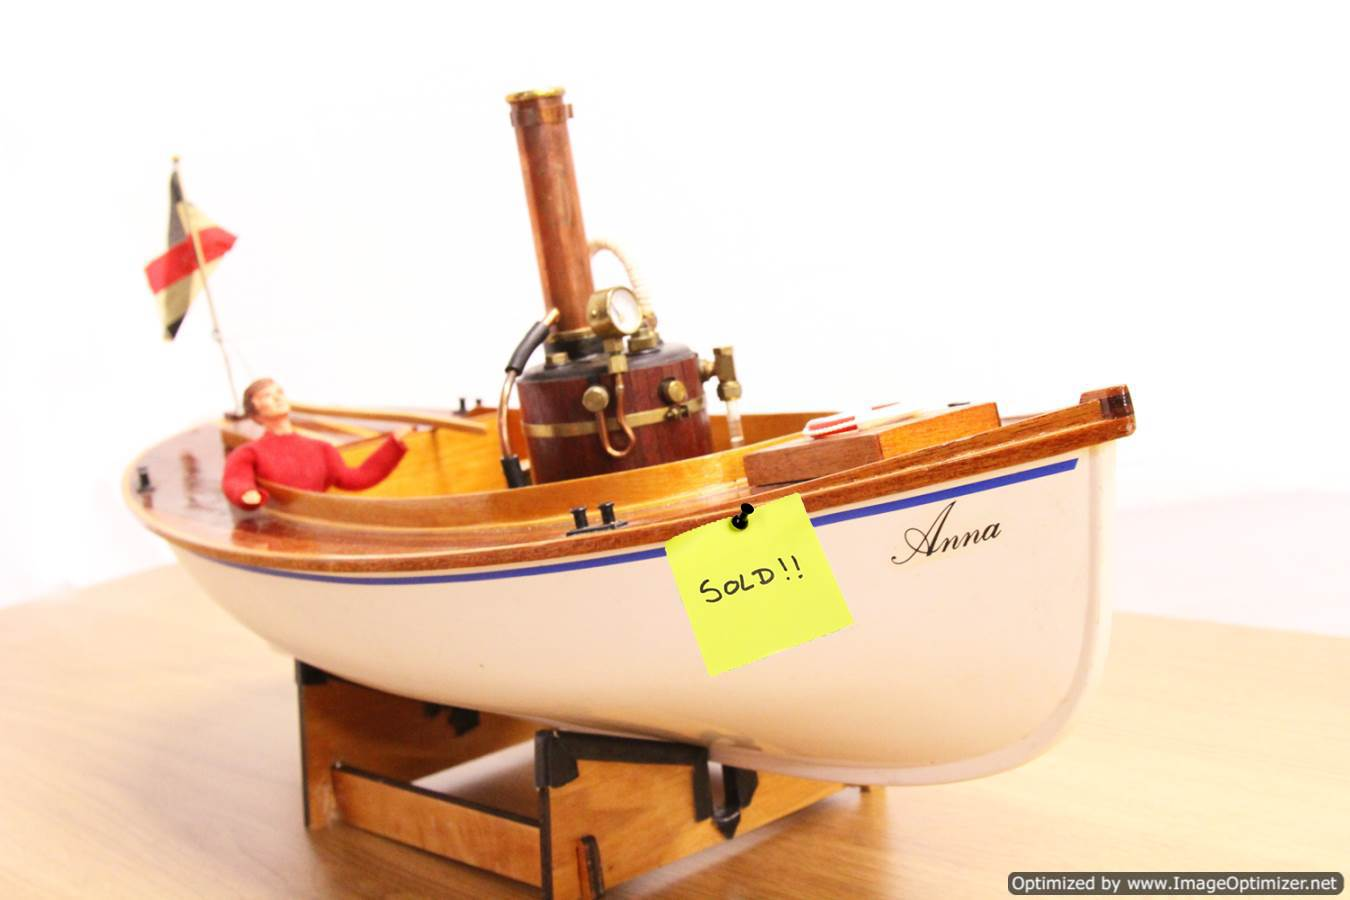 test Anna-Cheddar-steam-boat-live-steam-model-SOLD